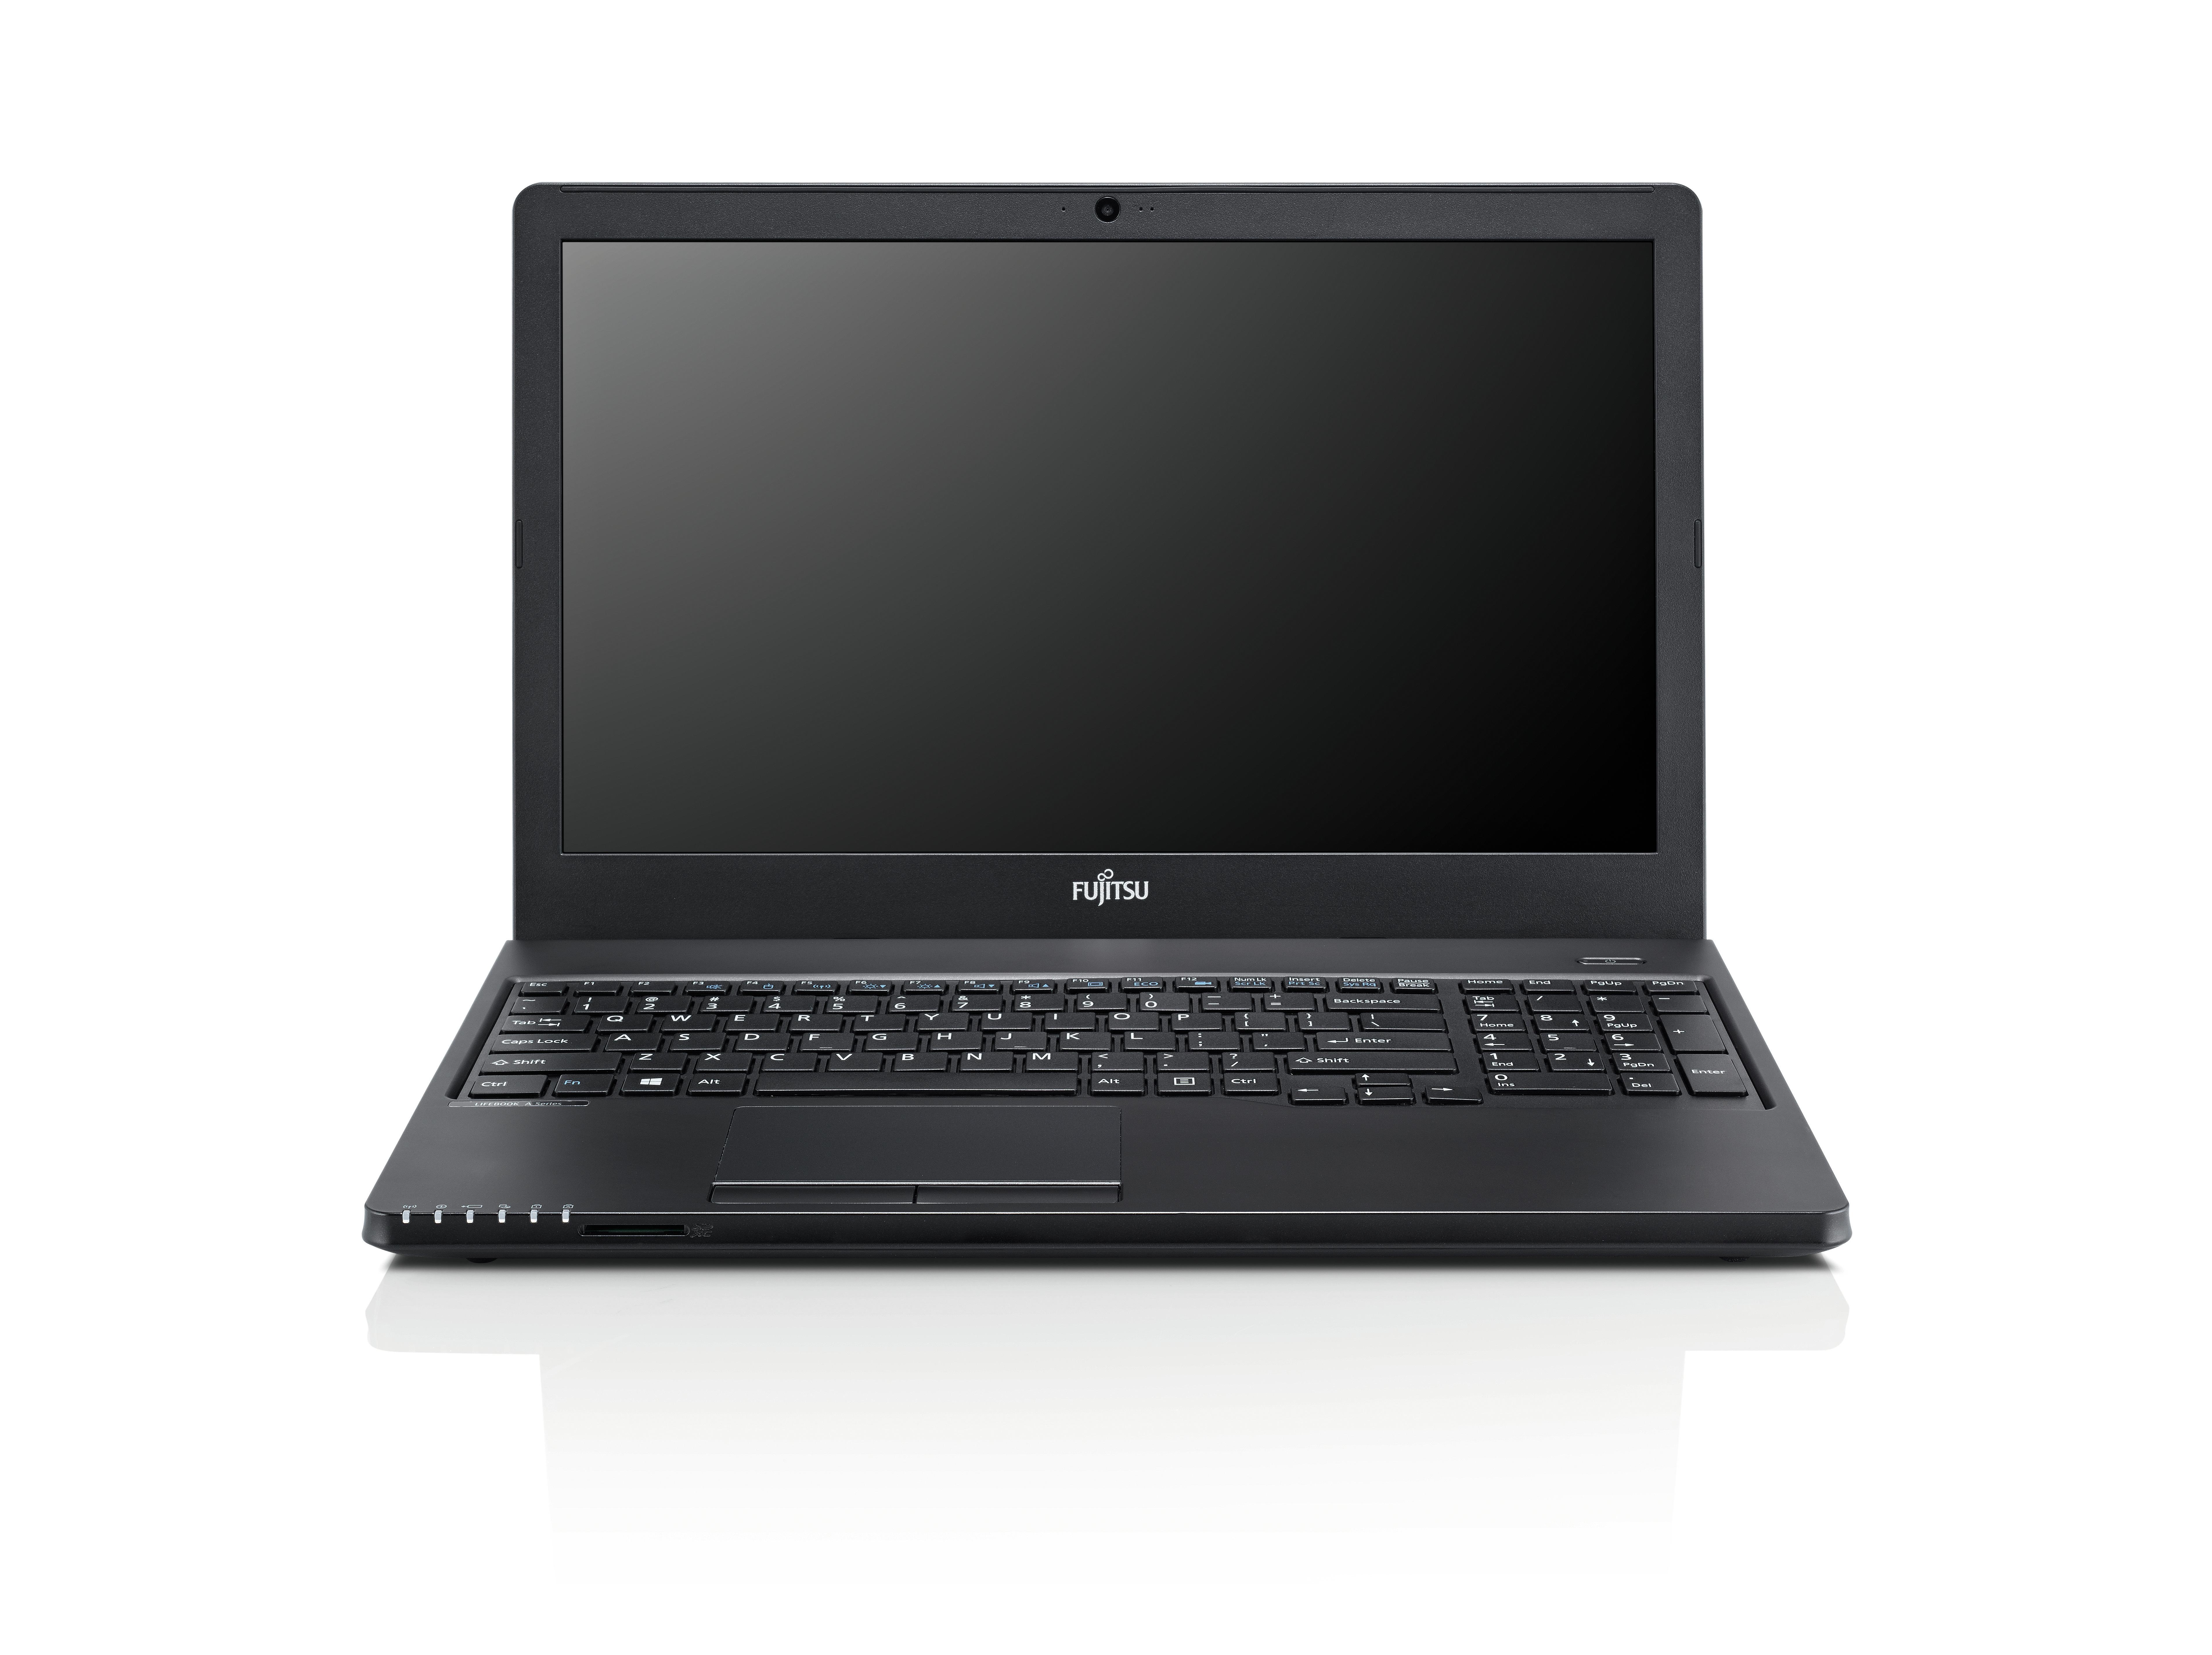 "Fujitsu LIFEBOOK A359 - 15,6"" Notebook - Core i5 Mobile 1,6 GHz 39,6 cm"